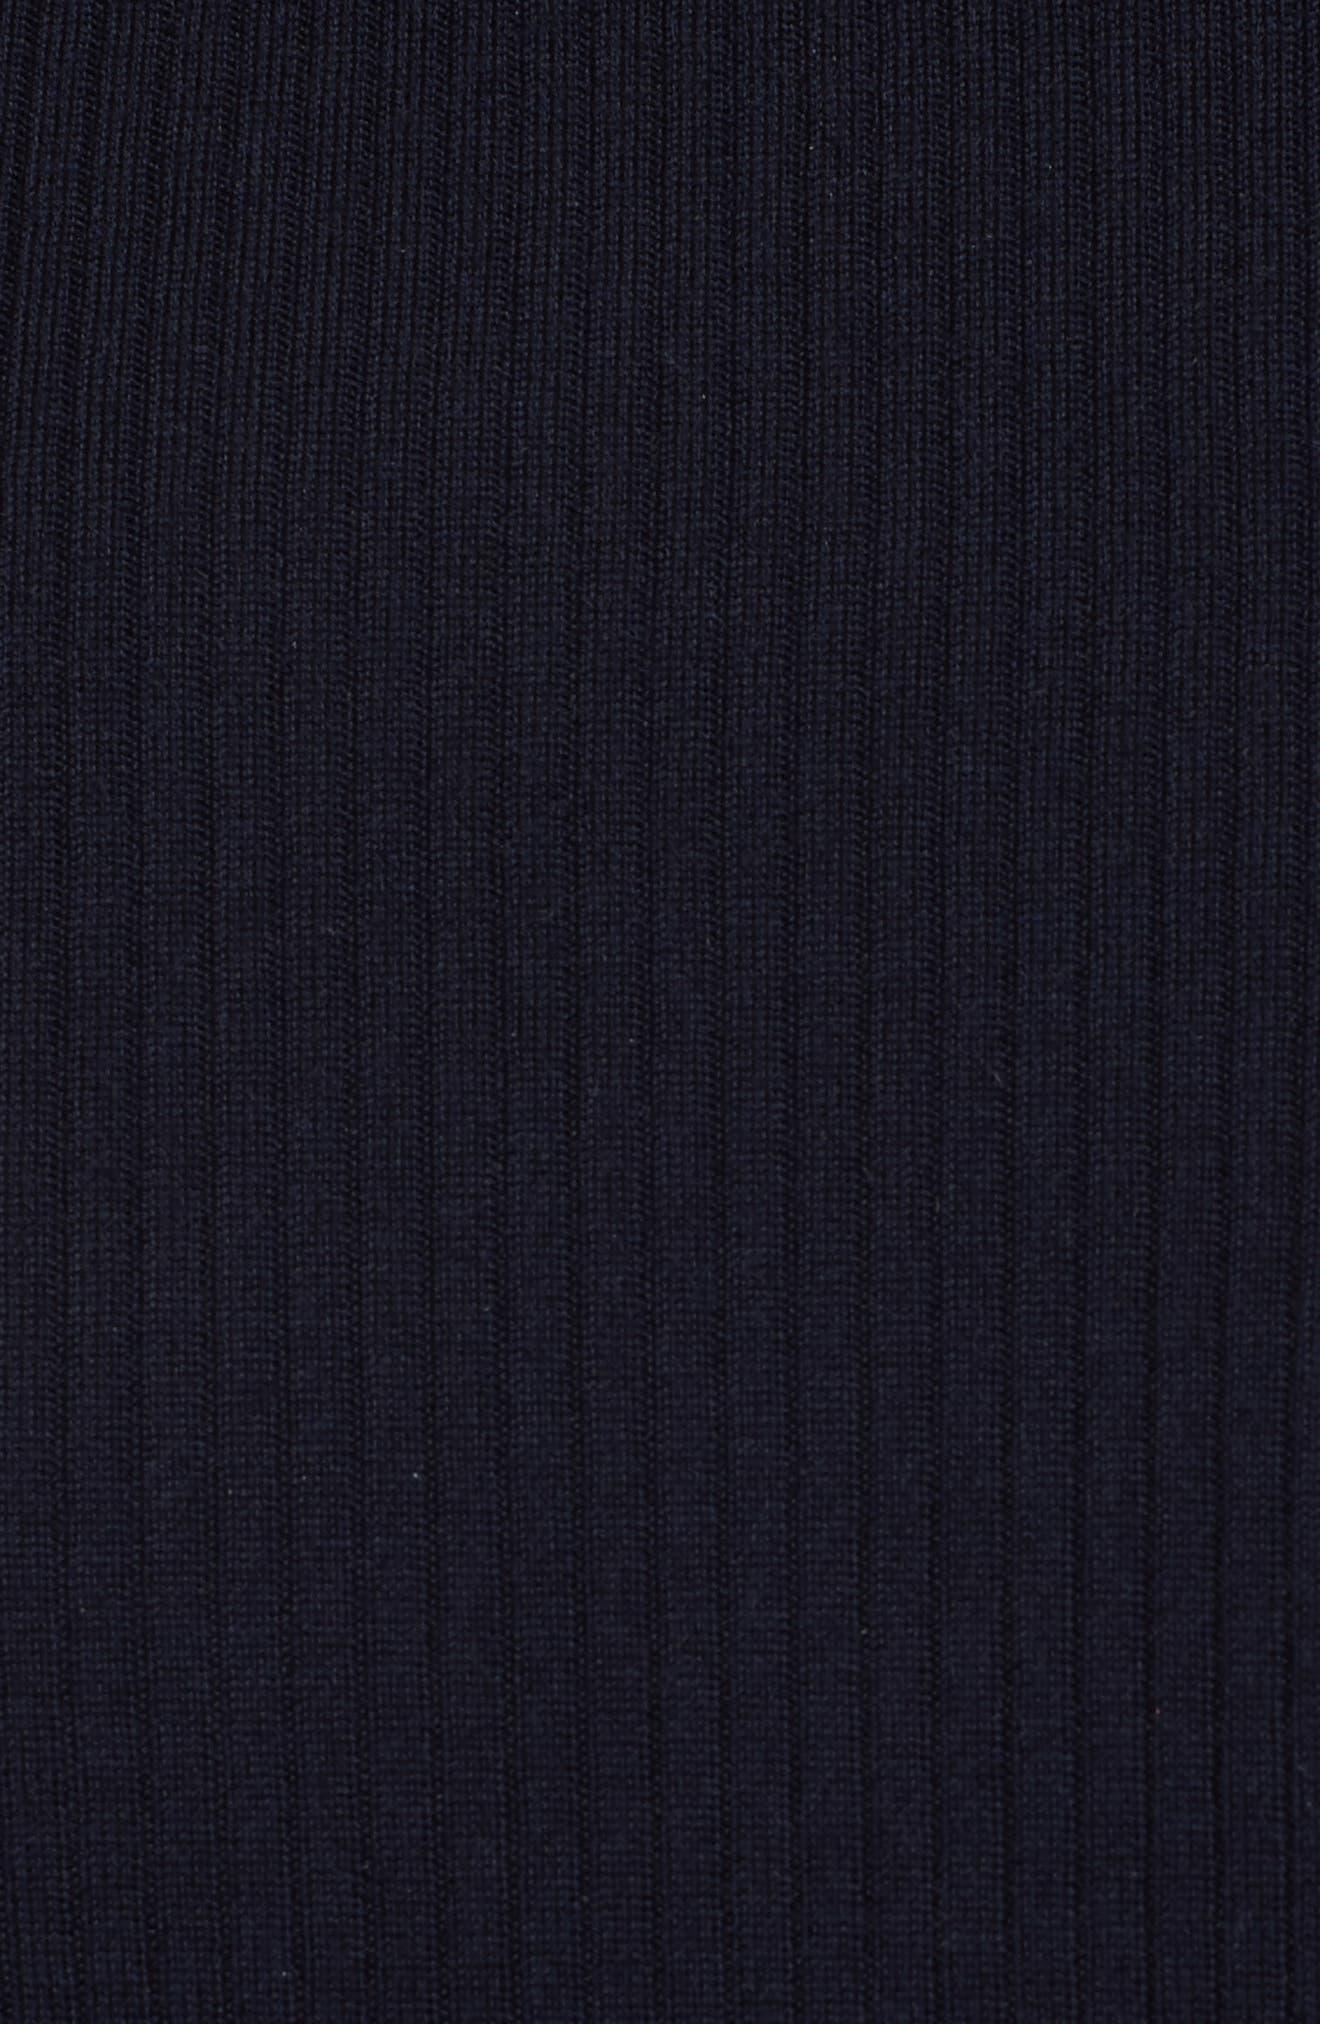 Merino Wool Blend Sweater,                             Alternate thumbnail 15, color,